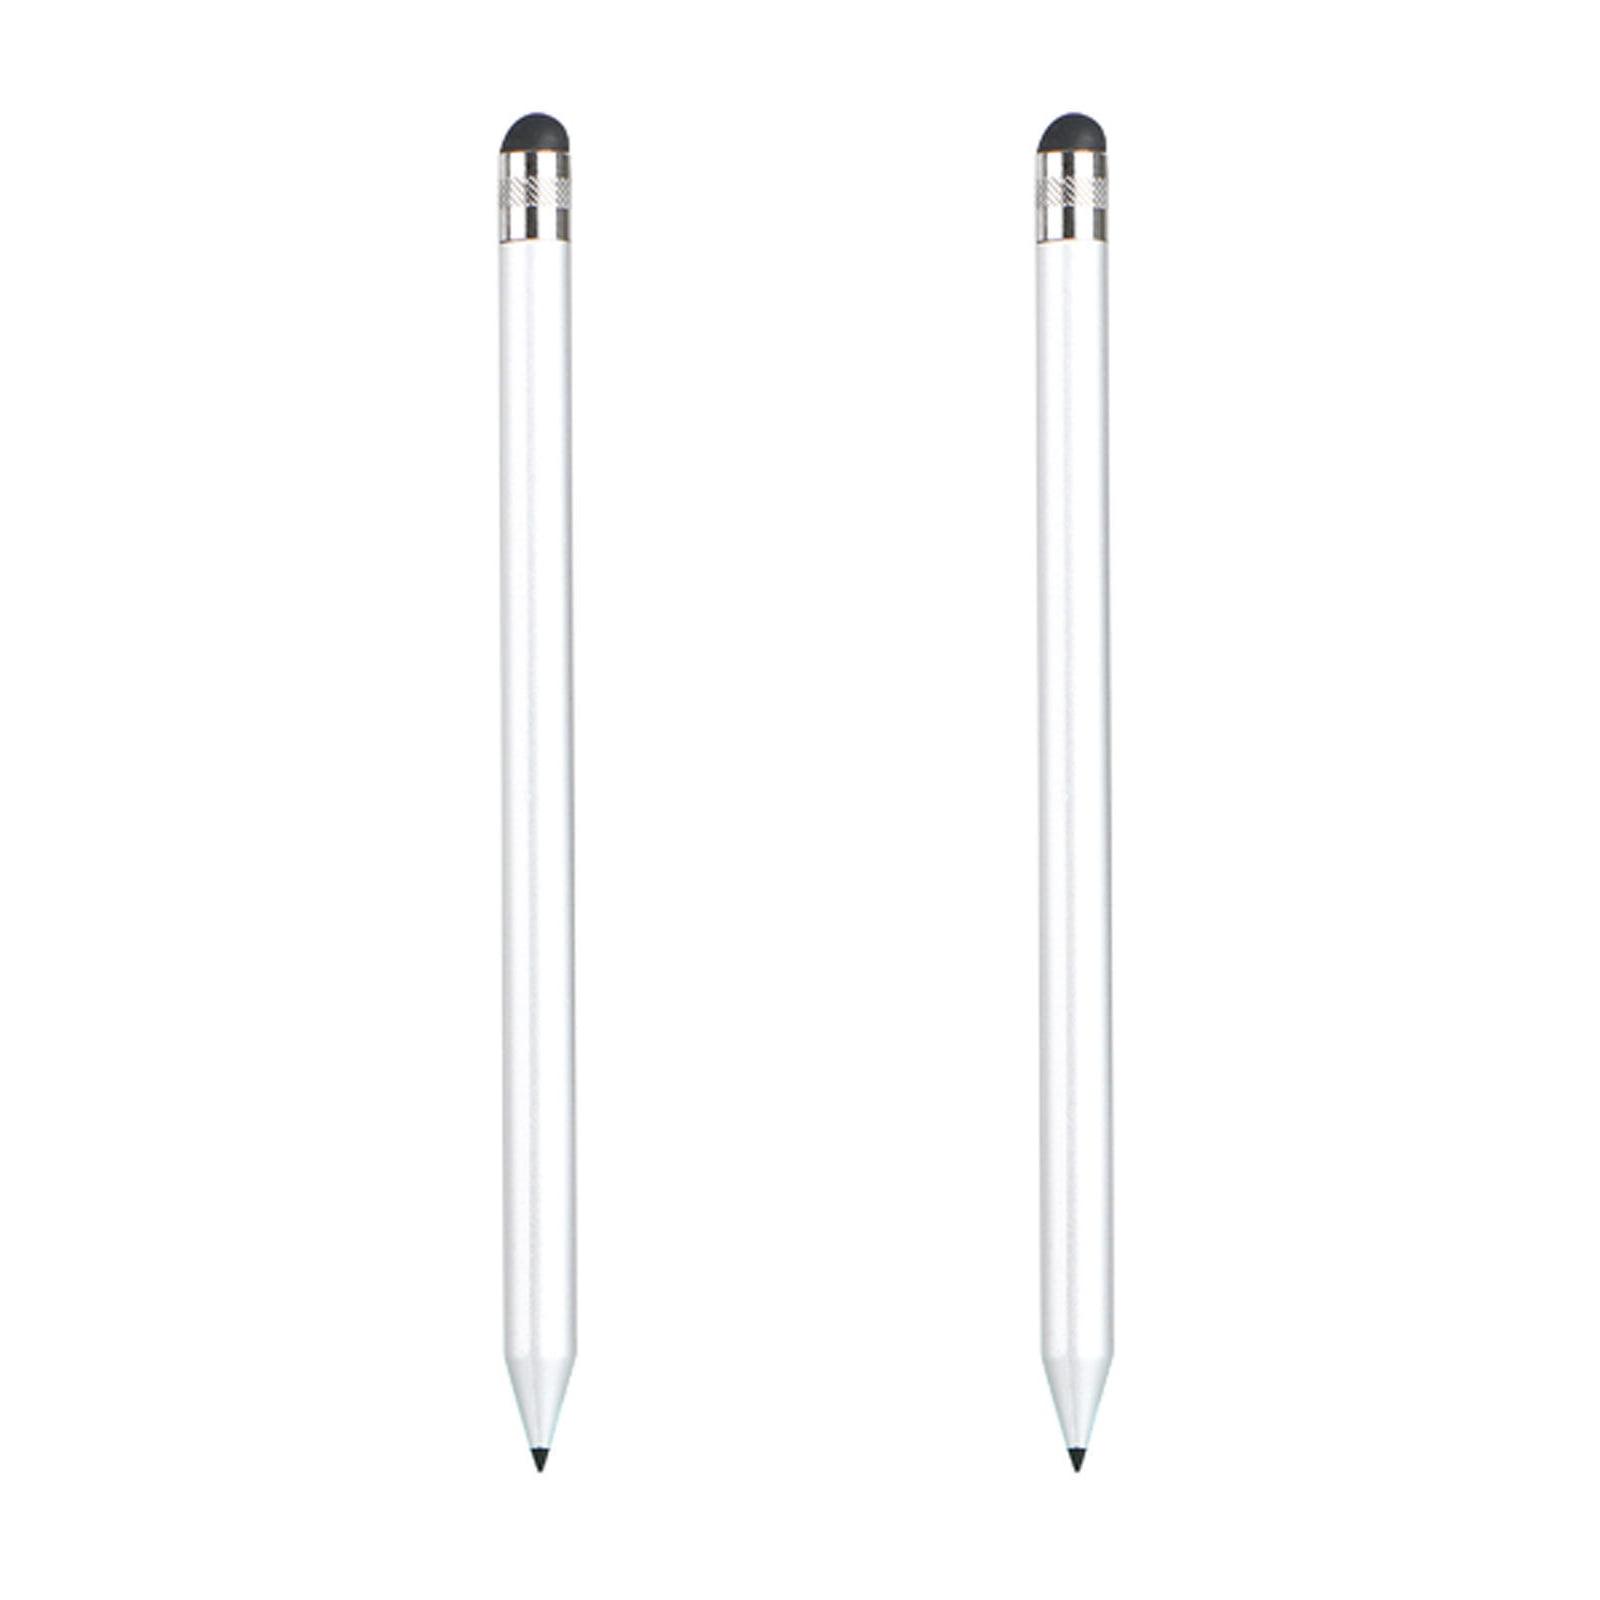 Black+White 2 Pack Flat Style High Sensitivity Touch Screen Stylus Pens